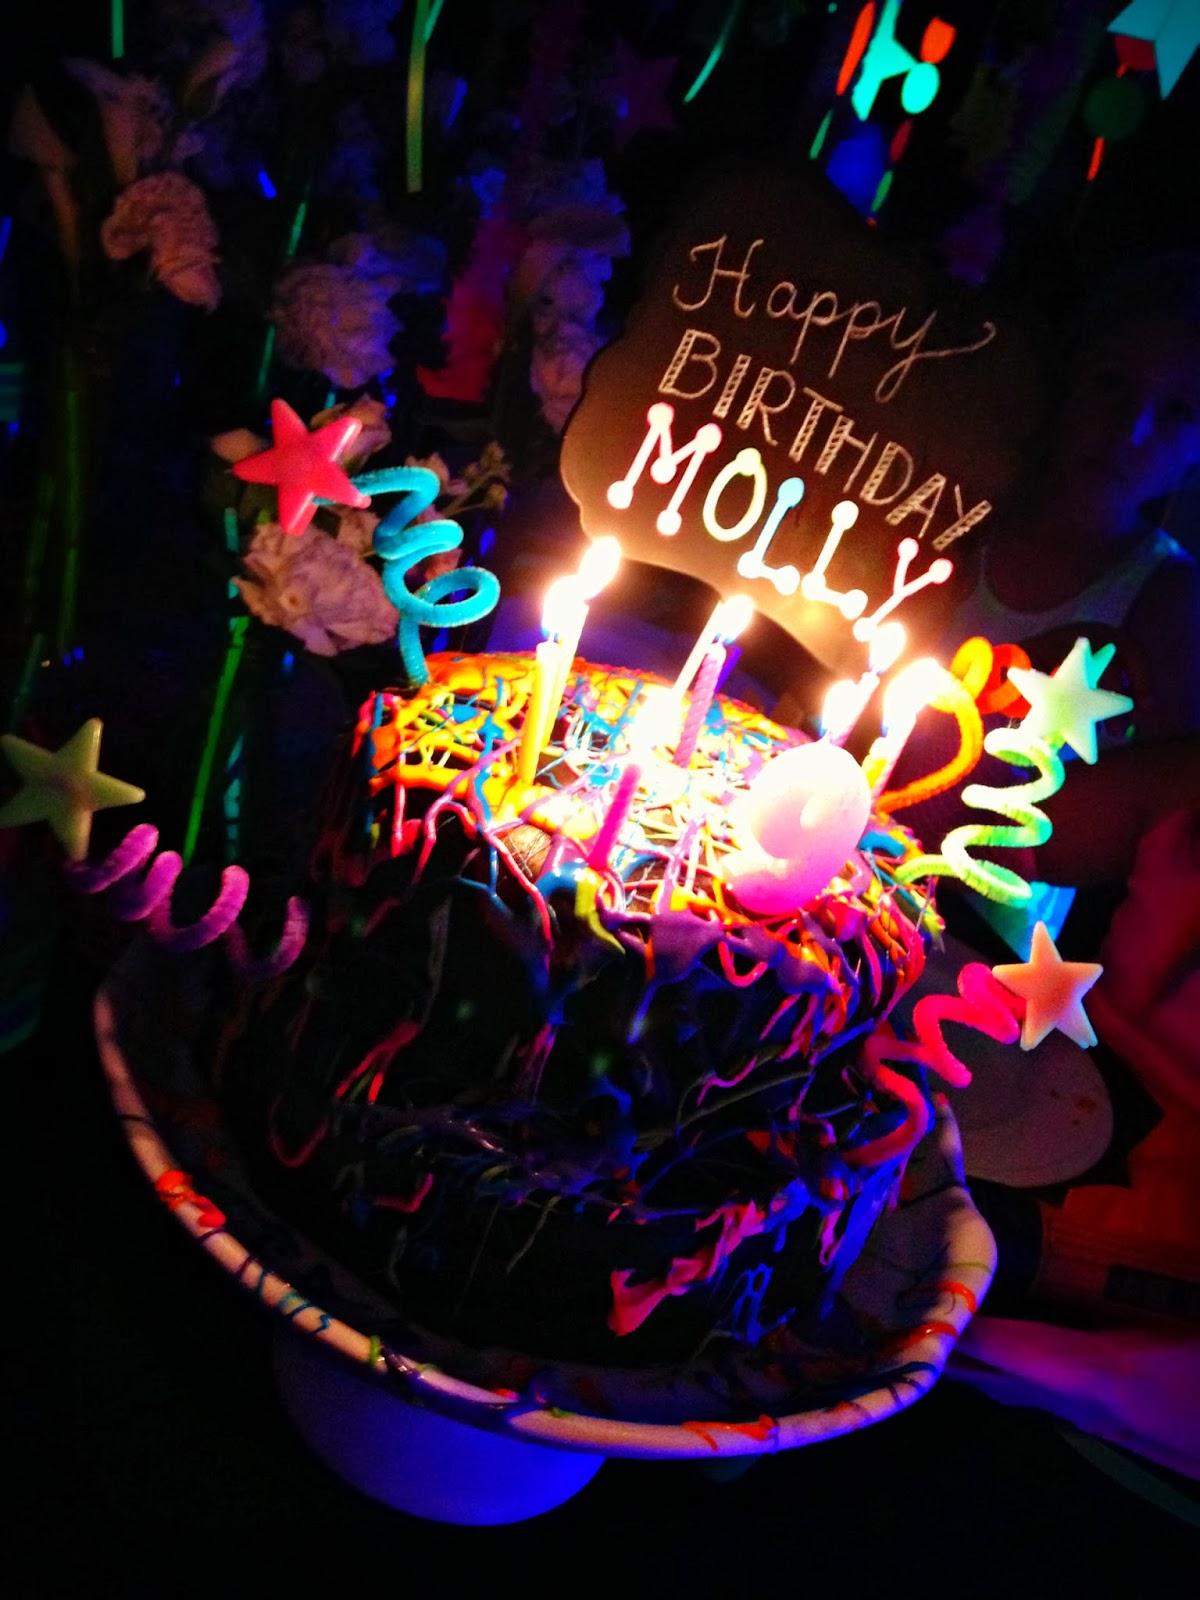 Bringing Up Burns Mollys NINTH NeonGlow in the Dark Dance